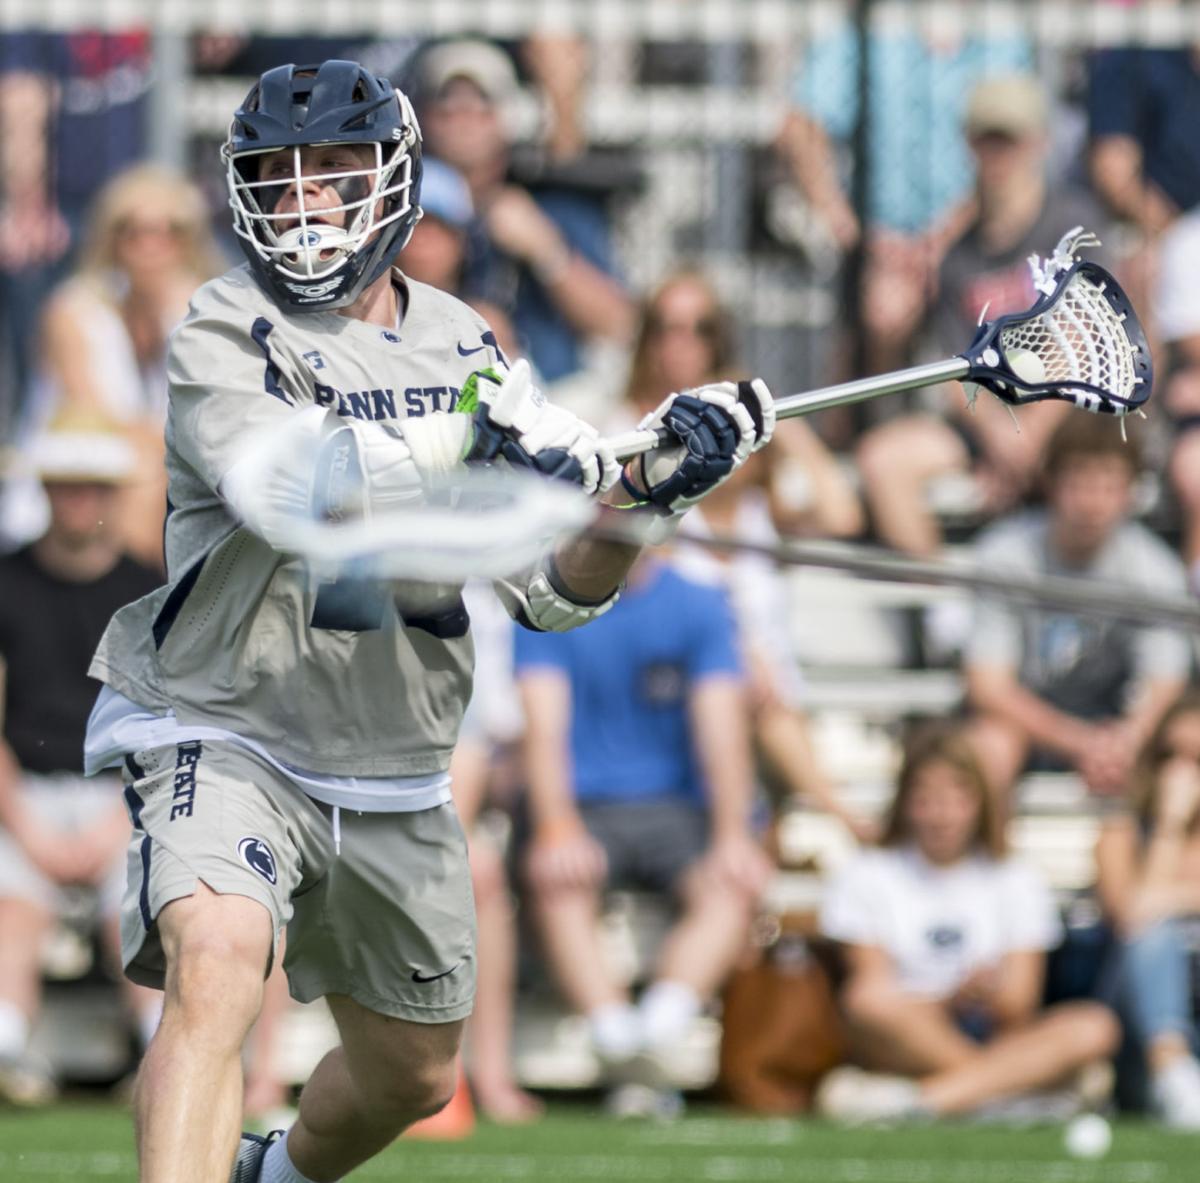 No. 14 Penn State men's lacrosse Spillane (13) upsets No. 5 Johns Hopkins